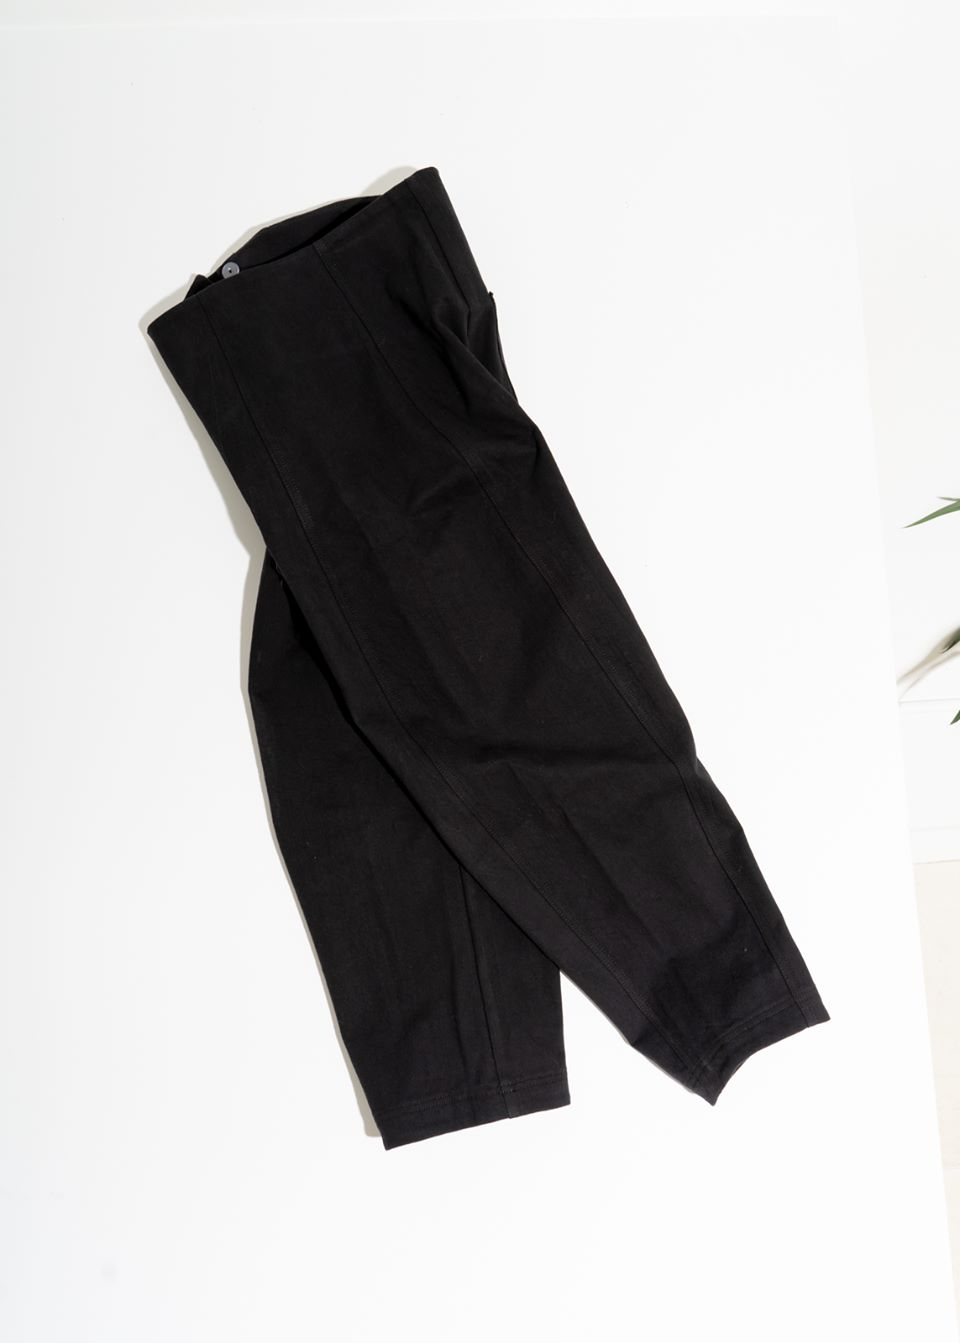 Creatures of Comfort Crescent Pant- Black